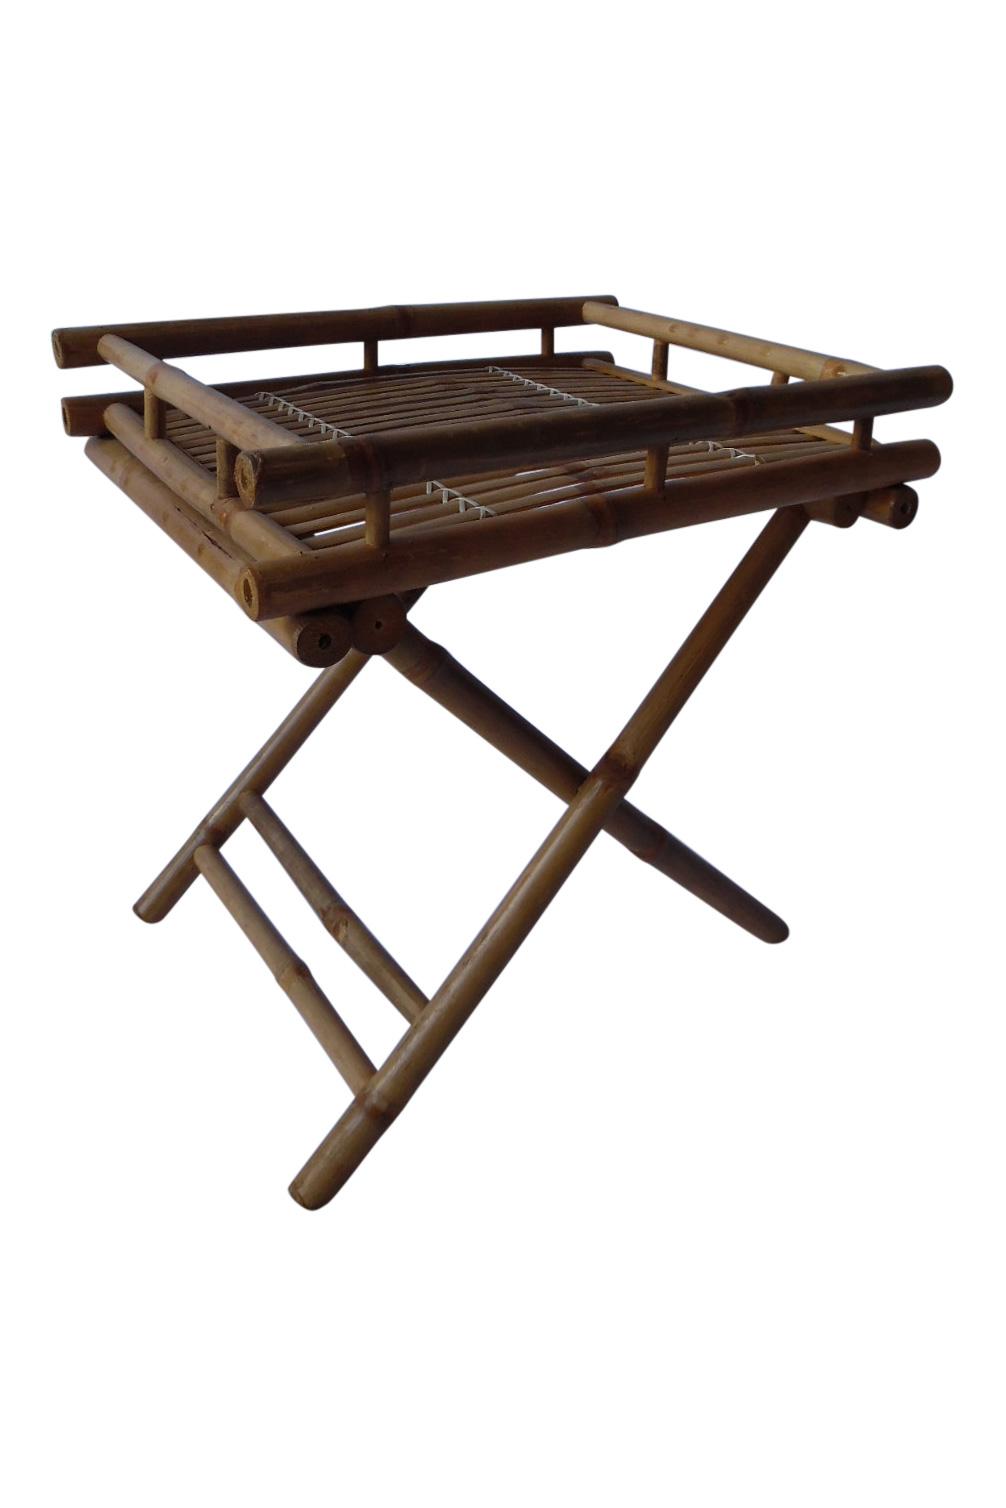 Home / Producten / Bamboe / Bamboe Meubelen / Bamboe bijzettafeltje ...